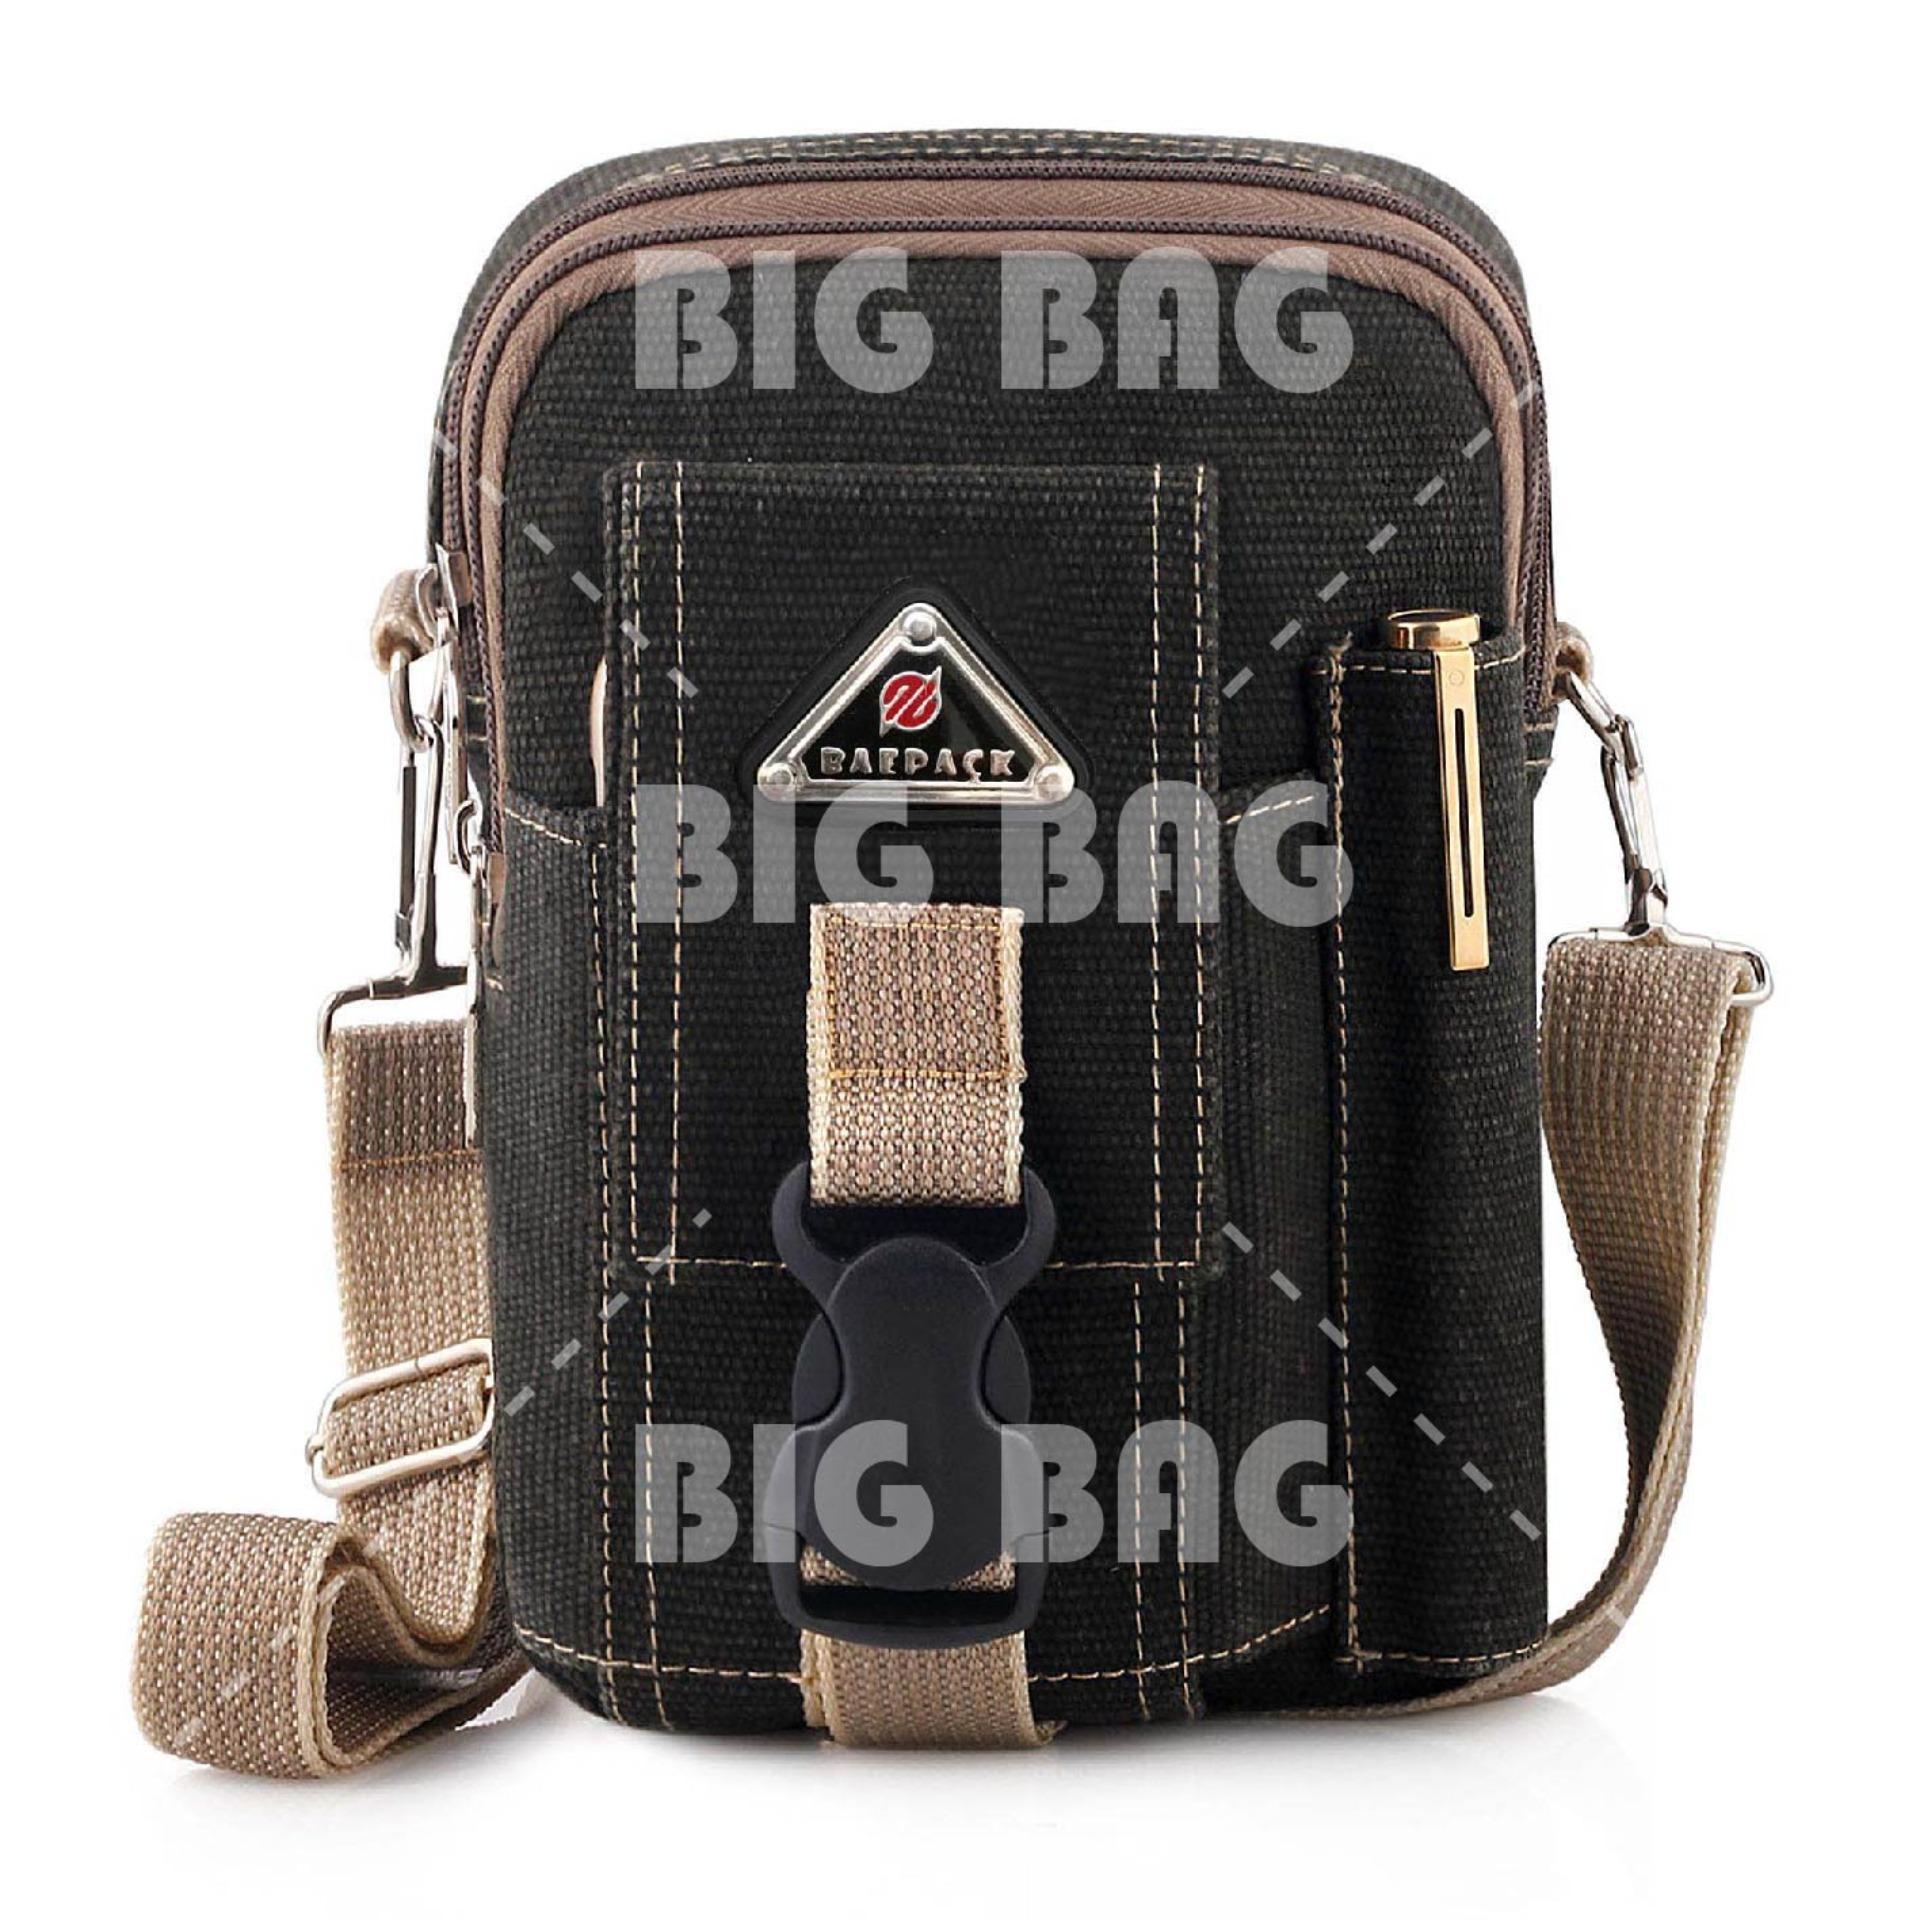 Tas Selempang Baepack Tactical Molle Canvas Triangle Waist Small Bag Military - Dark Grey Tas Pria